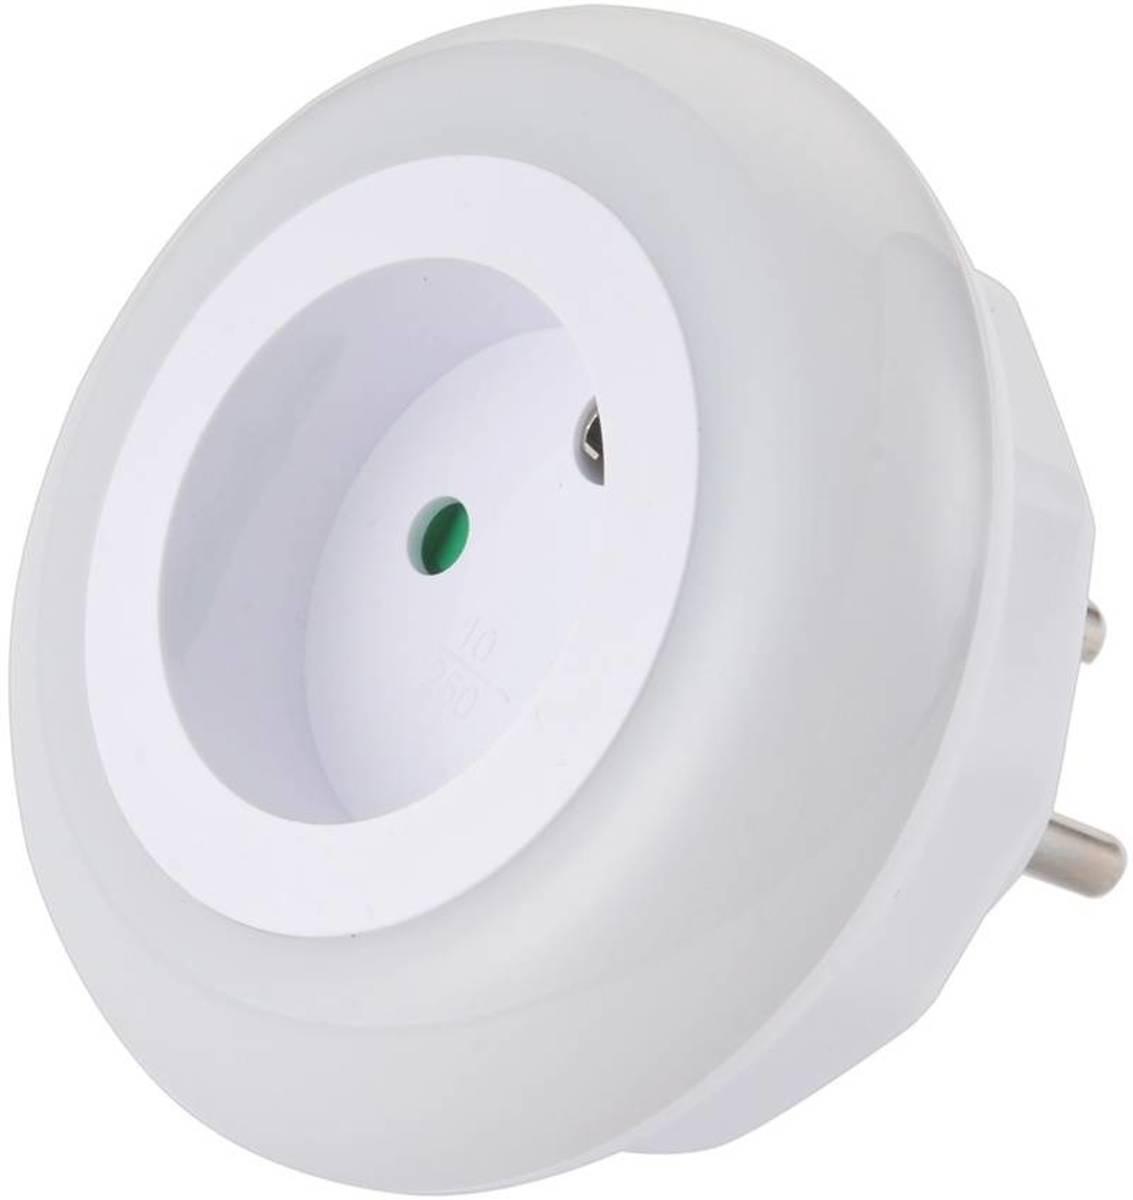 Nachtlampje stopcontact - wit licht - 3 LED lampjes